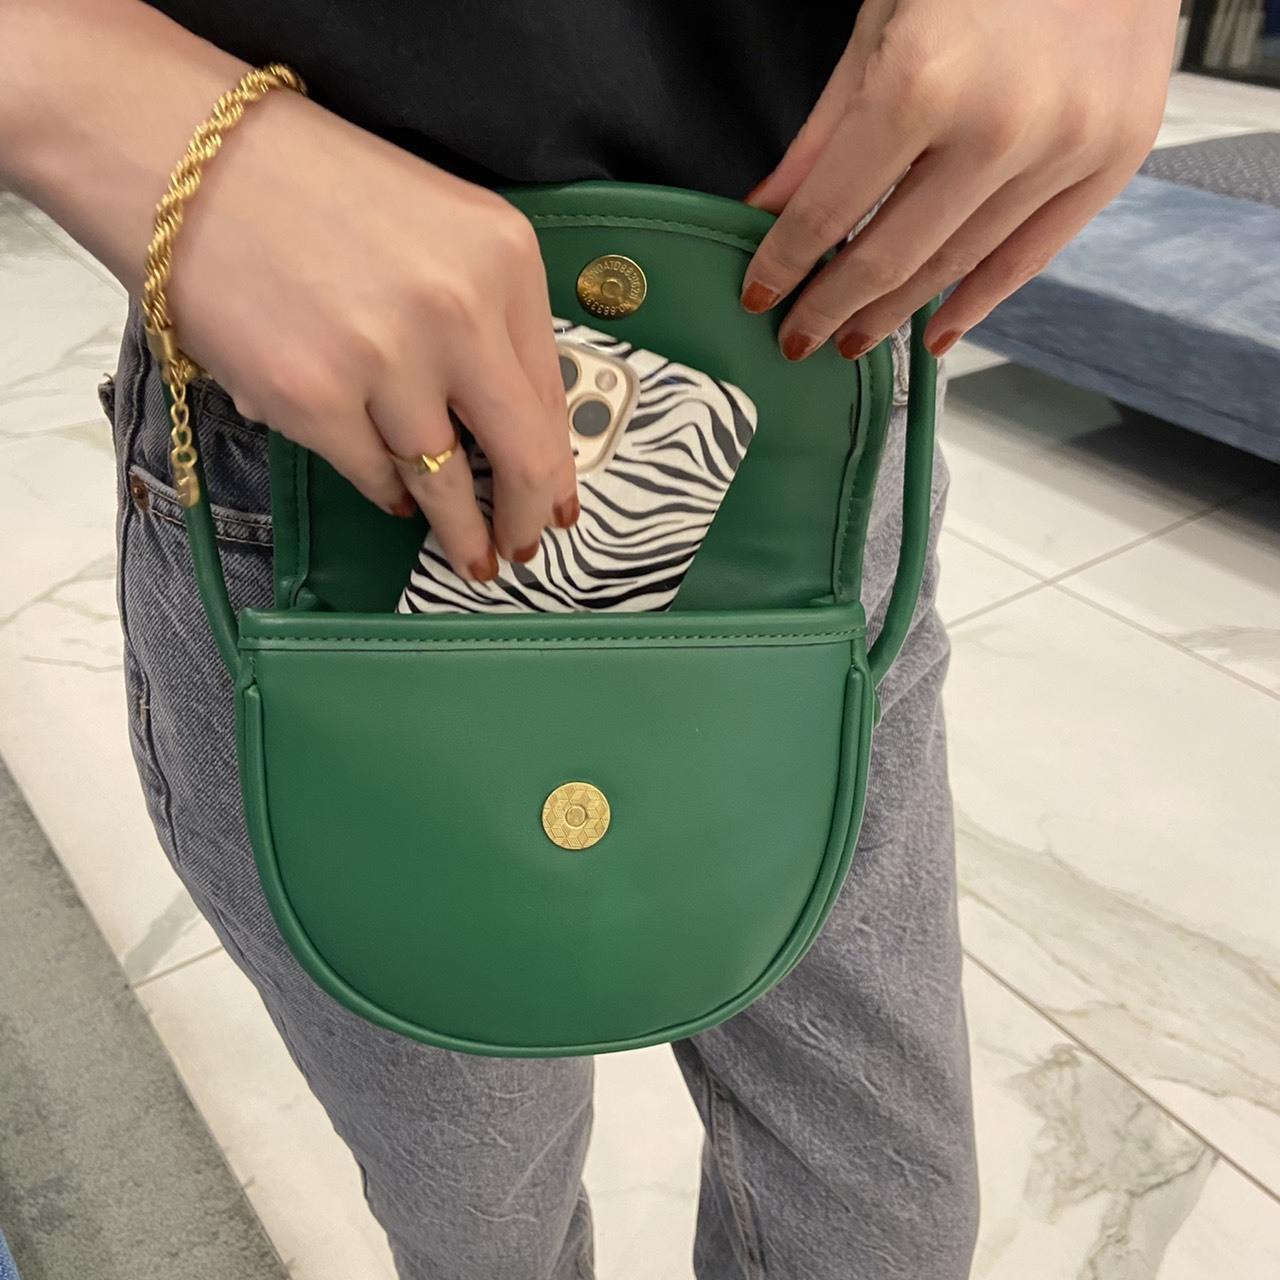 DAYNYC mini cross bag(green)